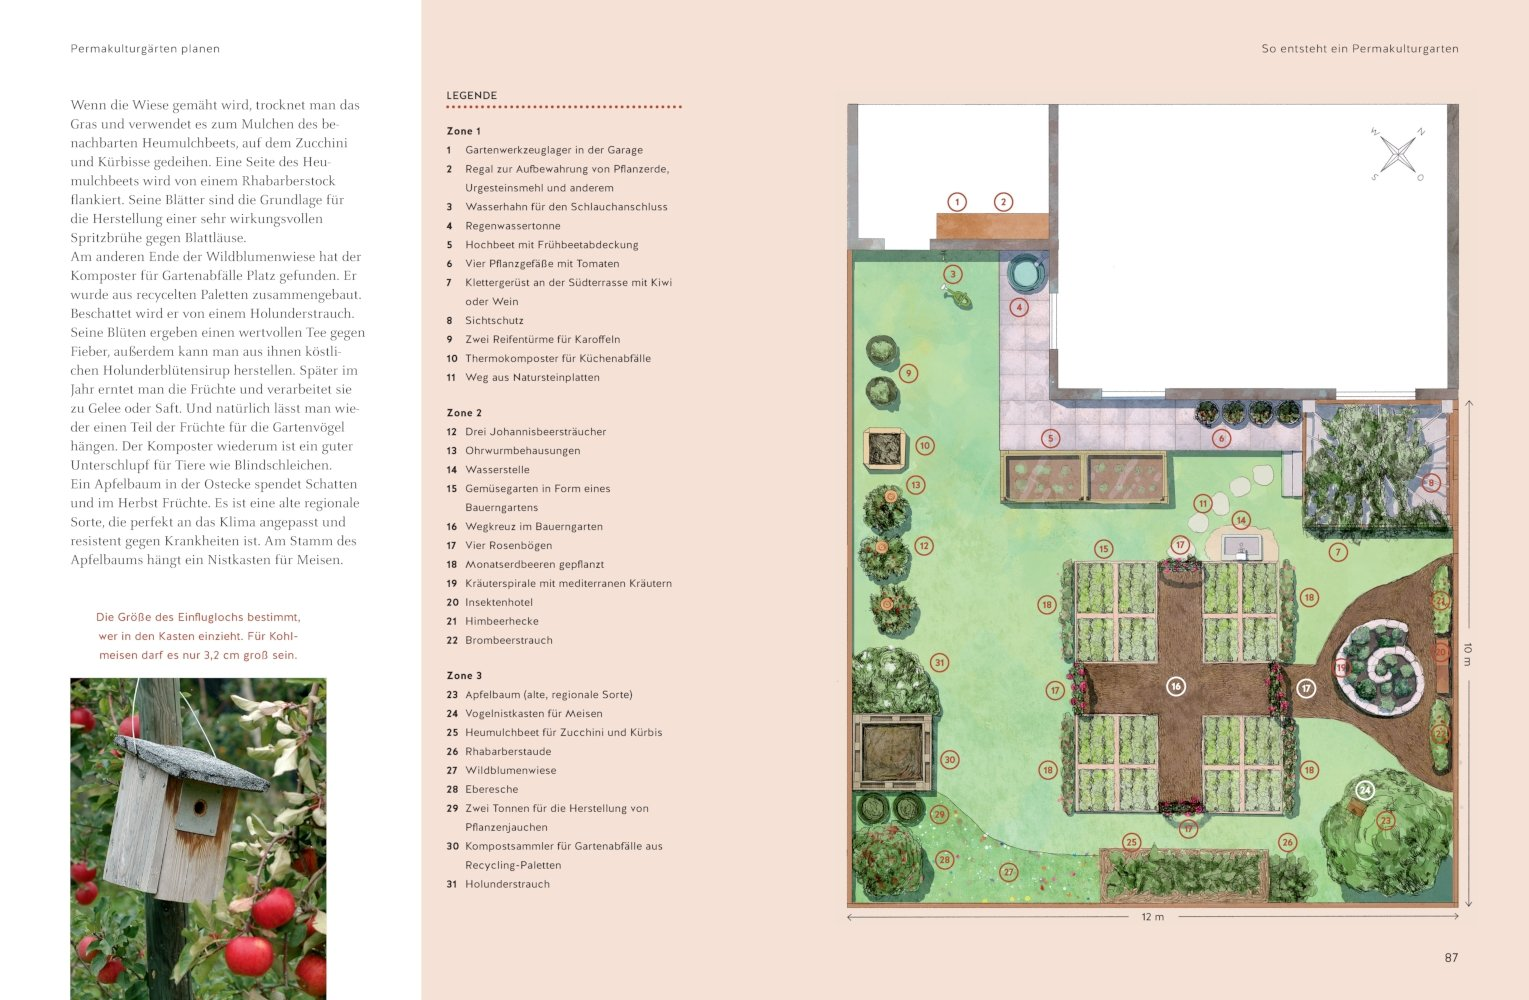 Klettergerüst Planen : Freudenstadt junge leute planen street workout park